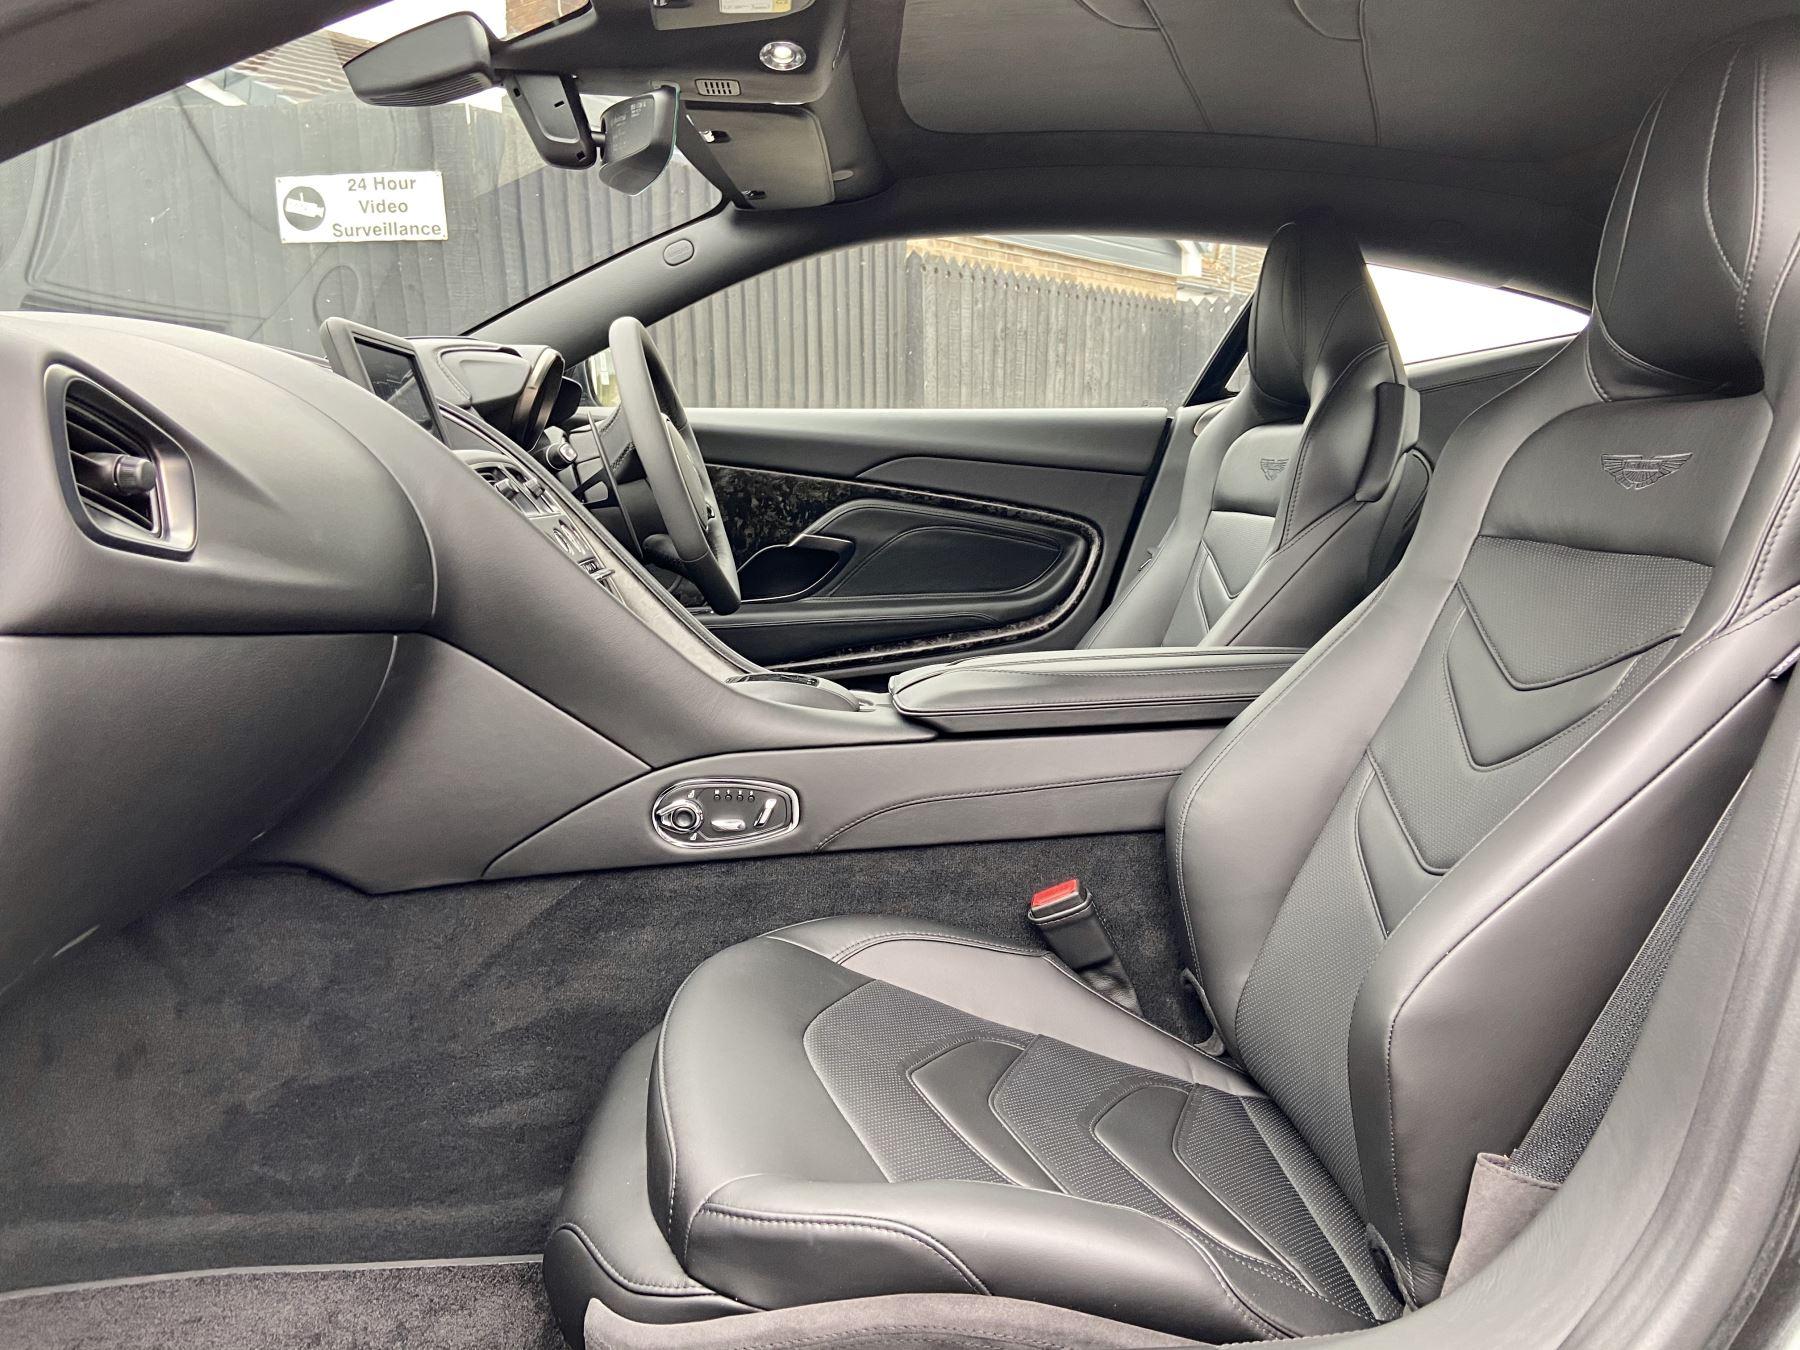 Aston Martin DBS V12 Superleggera Touchtronic image 3